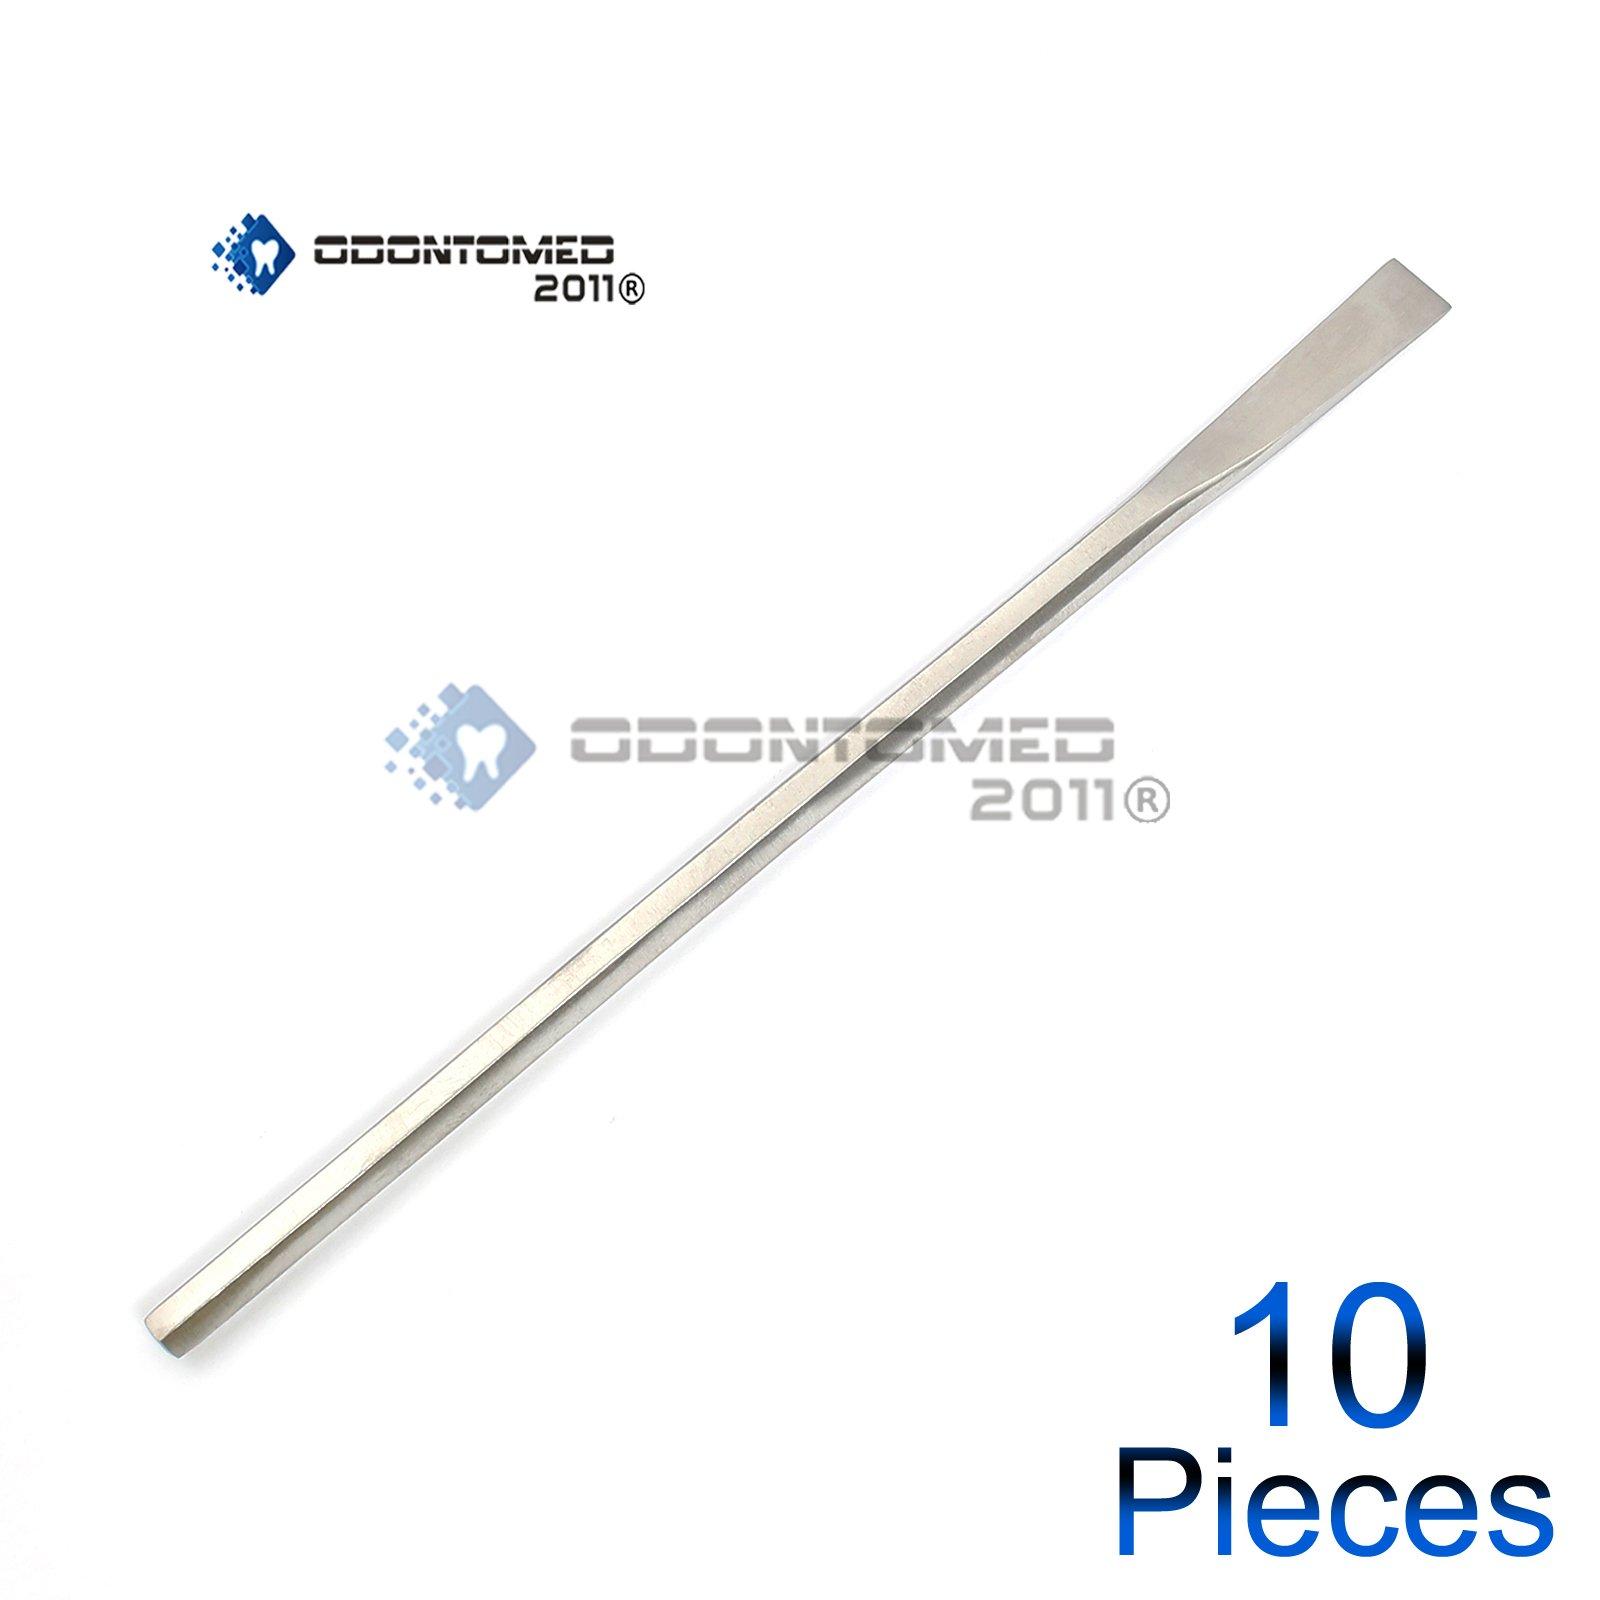 OdontoMed2011 10 PCS SHEEHAN STRAIGHT OSTEOTOME 15MM HEXAGON HANDLE 16CM DENTAL INSTRUMENTS ODM